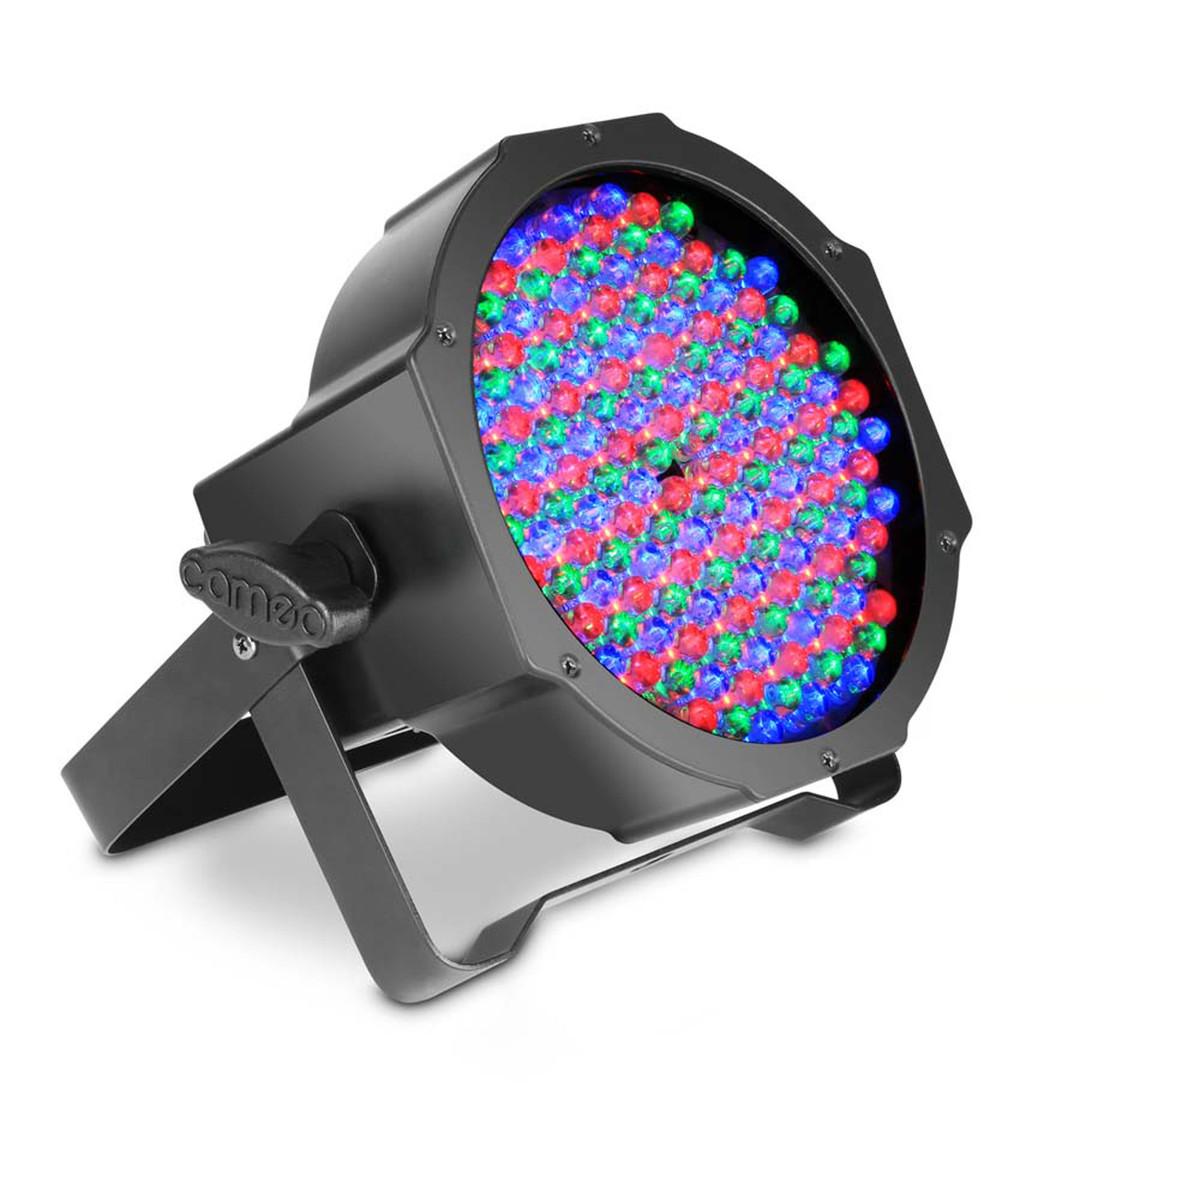 Image of Cameo 144 x 10mm RGB LED Flat Par Can Spotlight Black